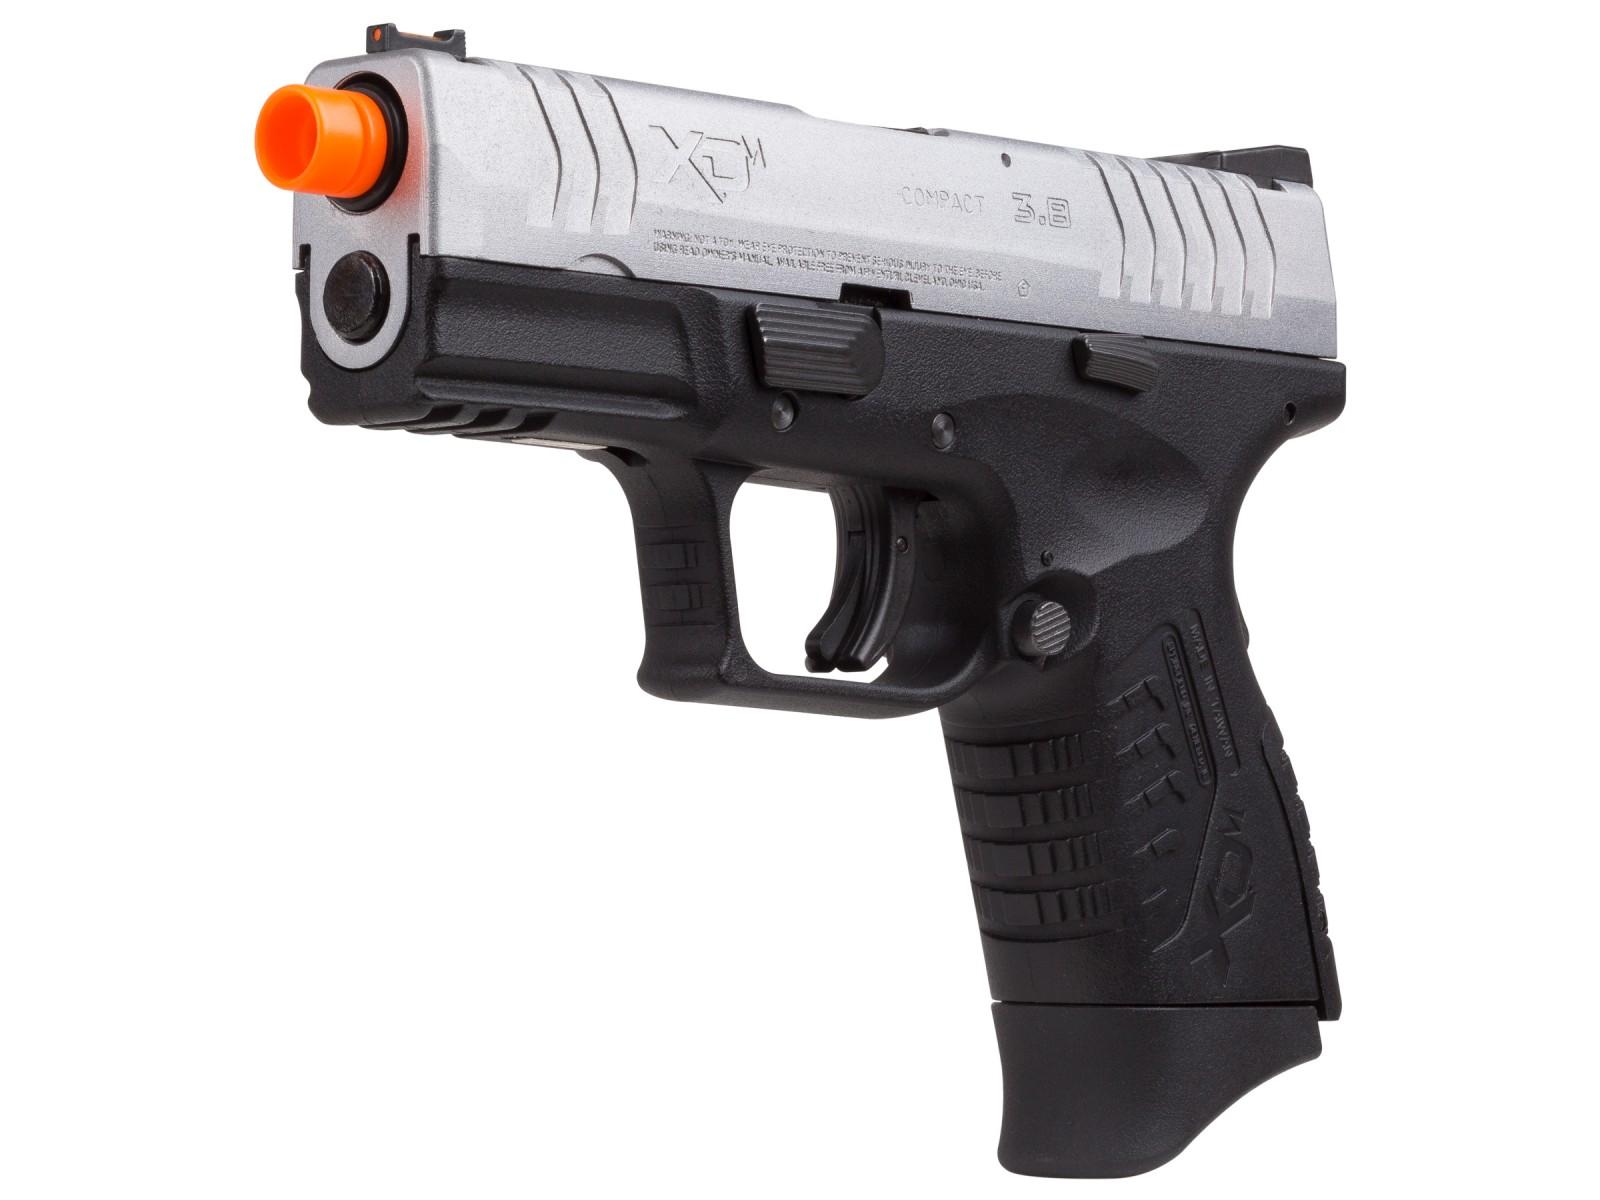 Springfield_Armory_XDM_38_GBB_Airsoft_Pistol_BiTone_6mm